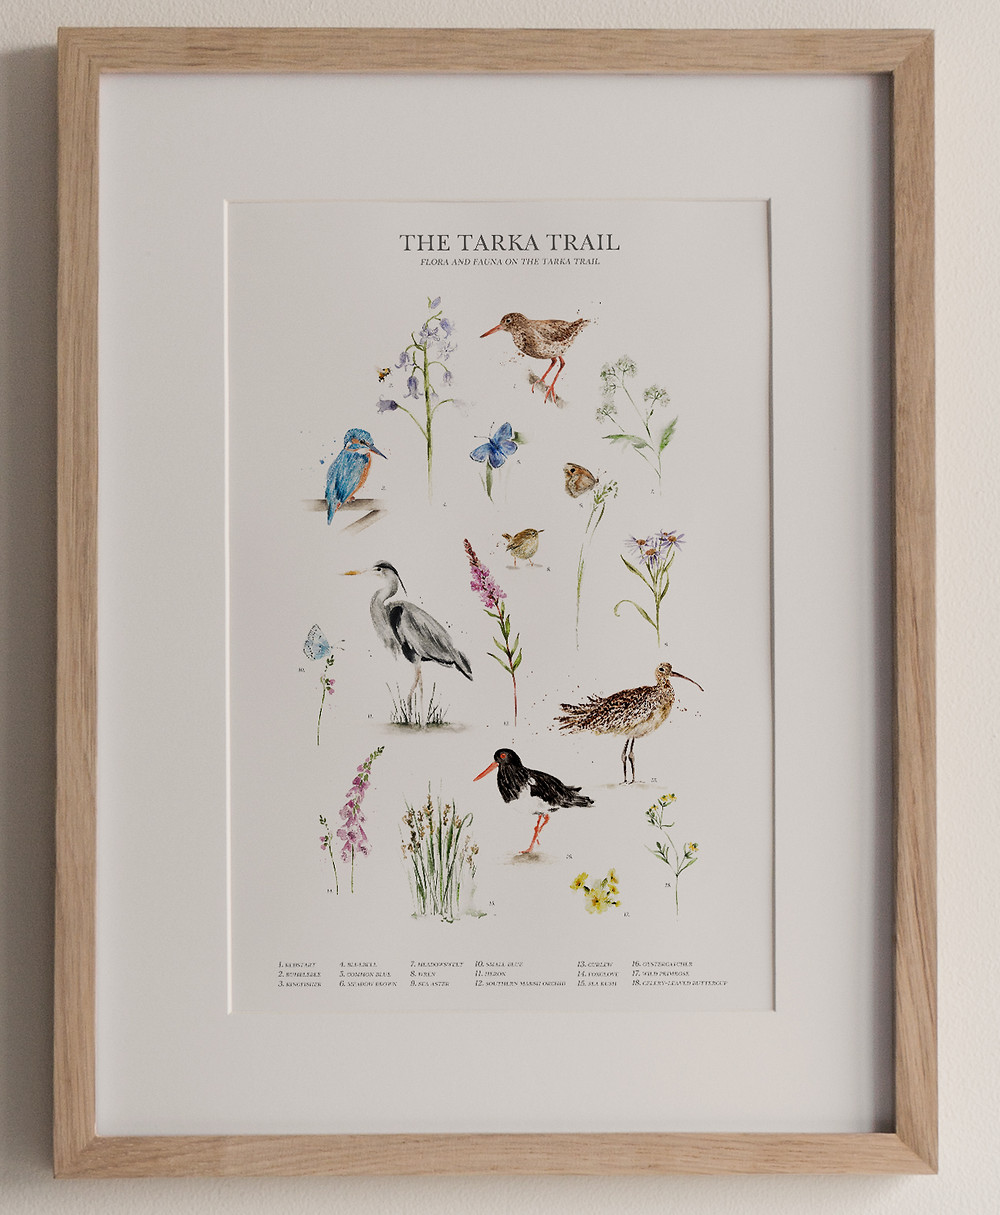 Framed art print of wildlife from the Tarka Trail